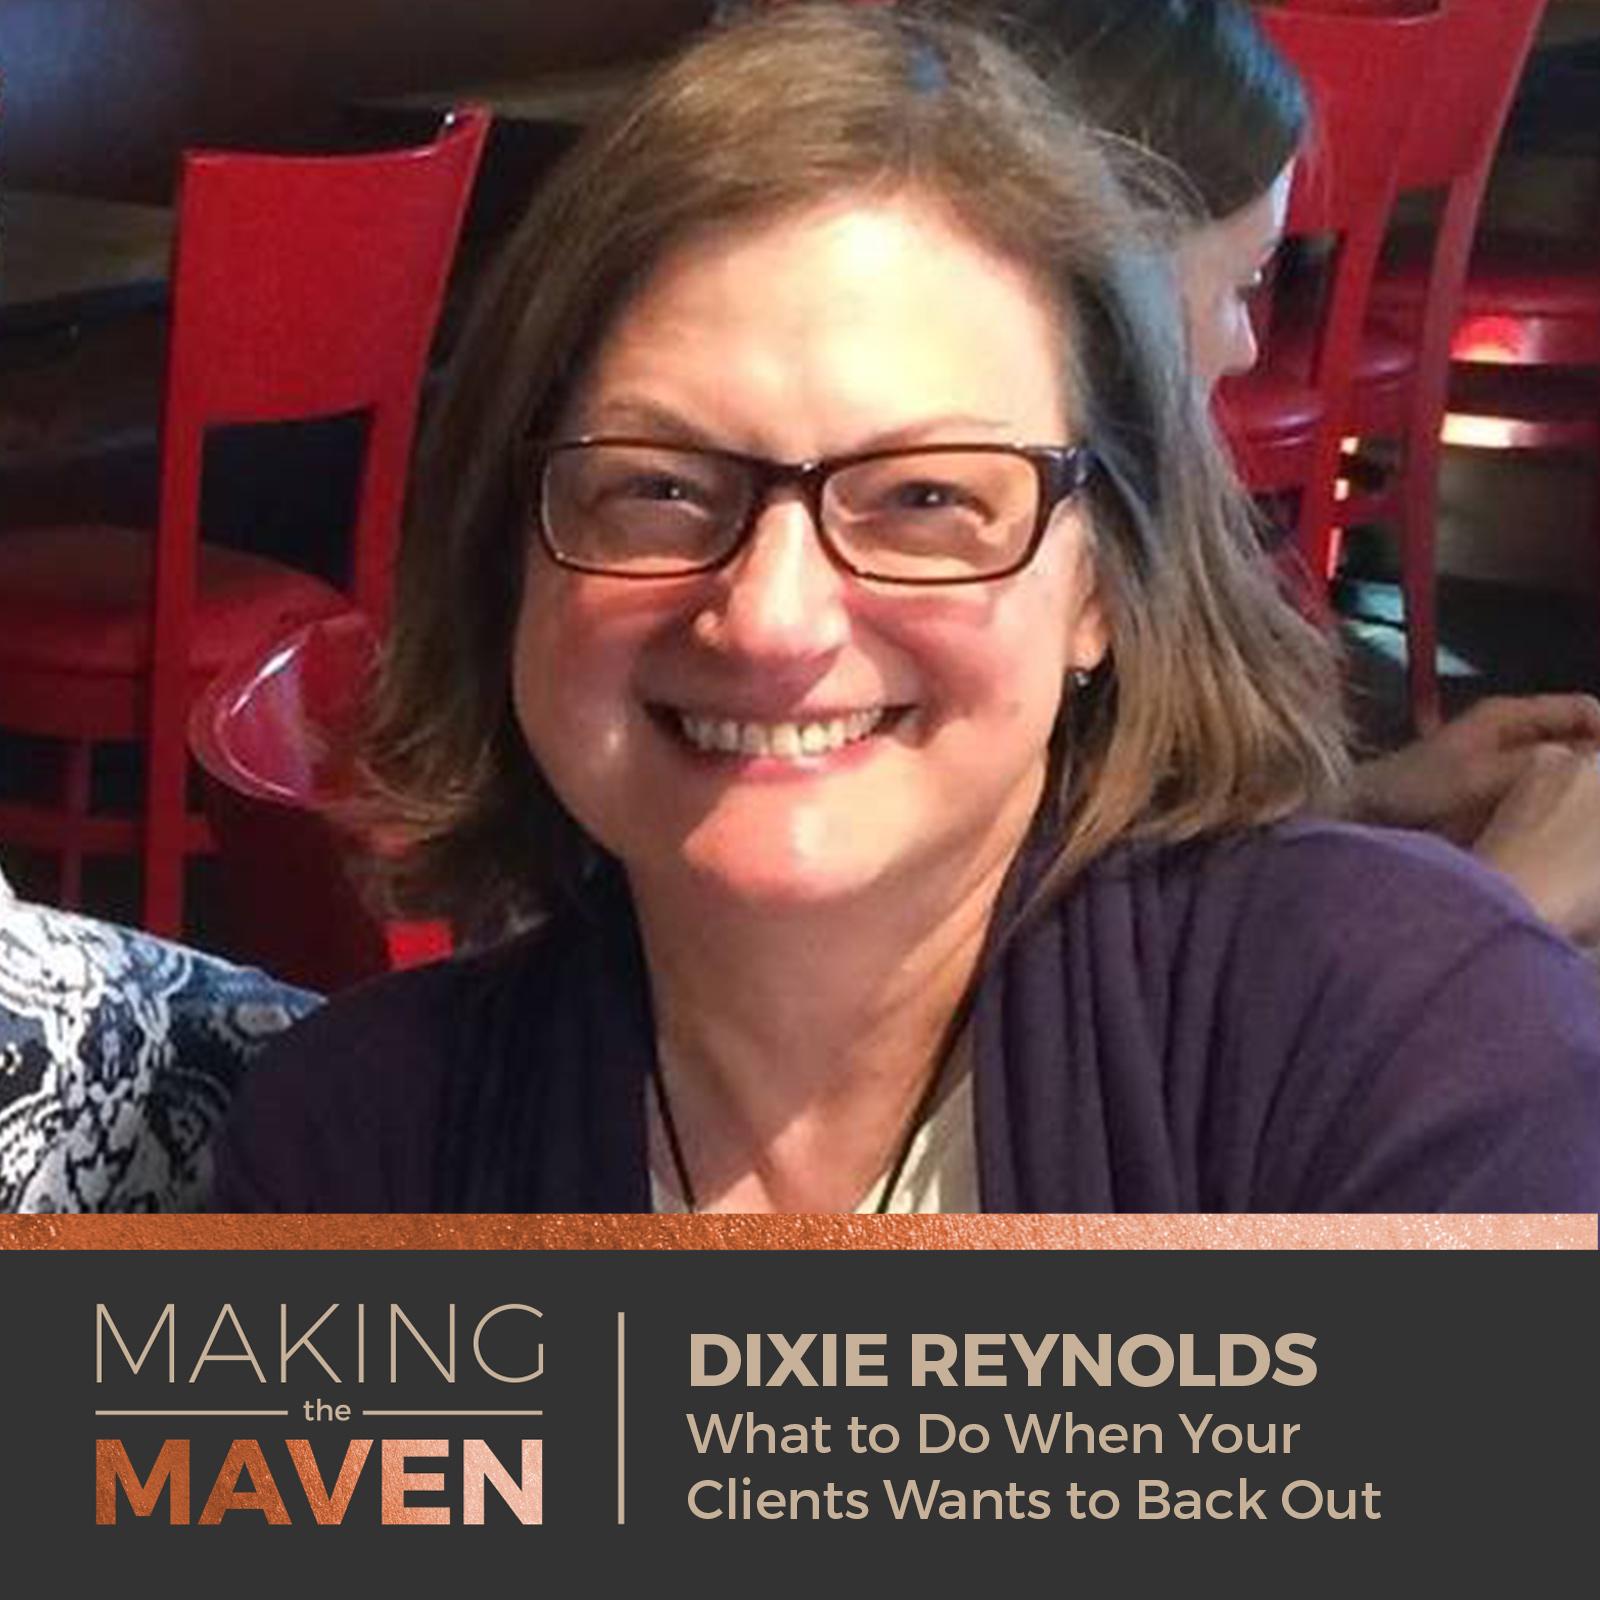 Dixie Reynolds